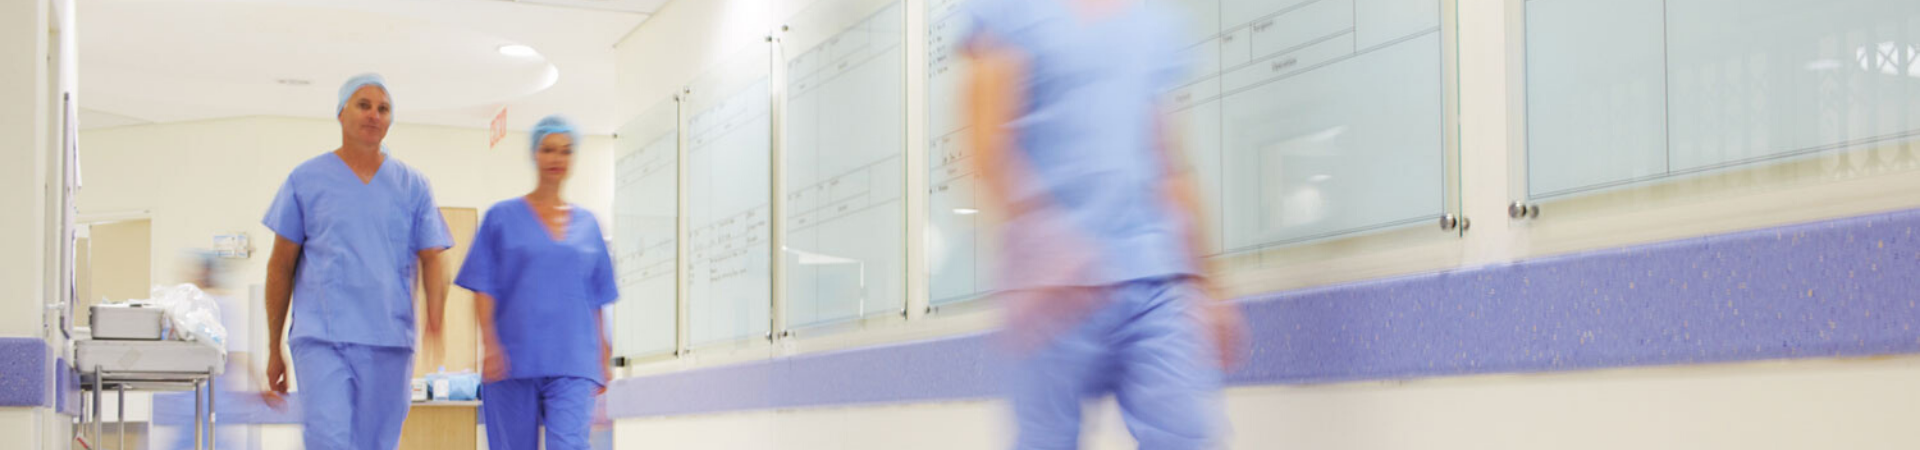 Healthcare | How will covid-19 reshape key Australian industries?